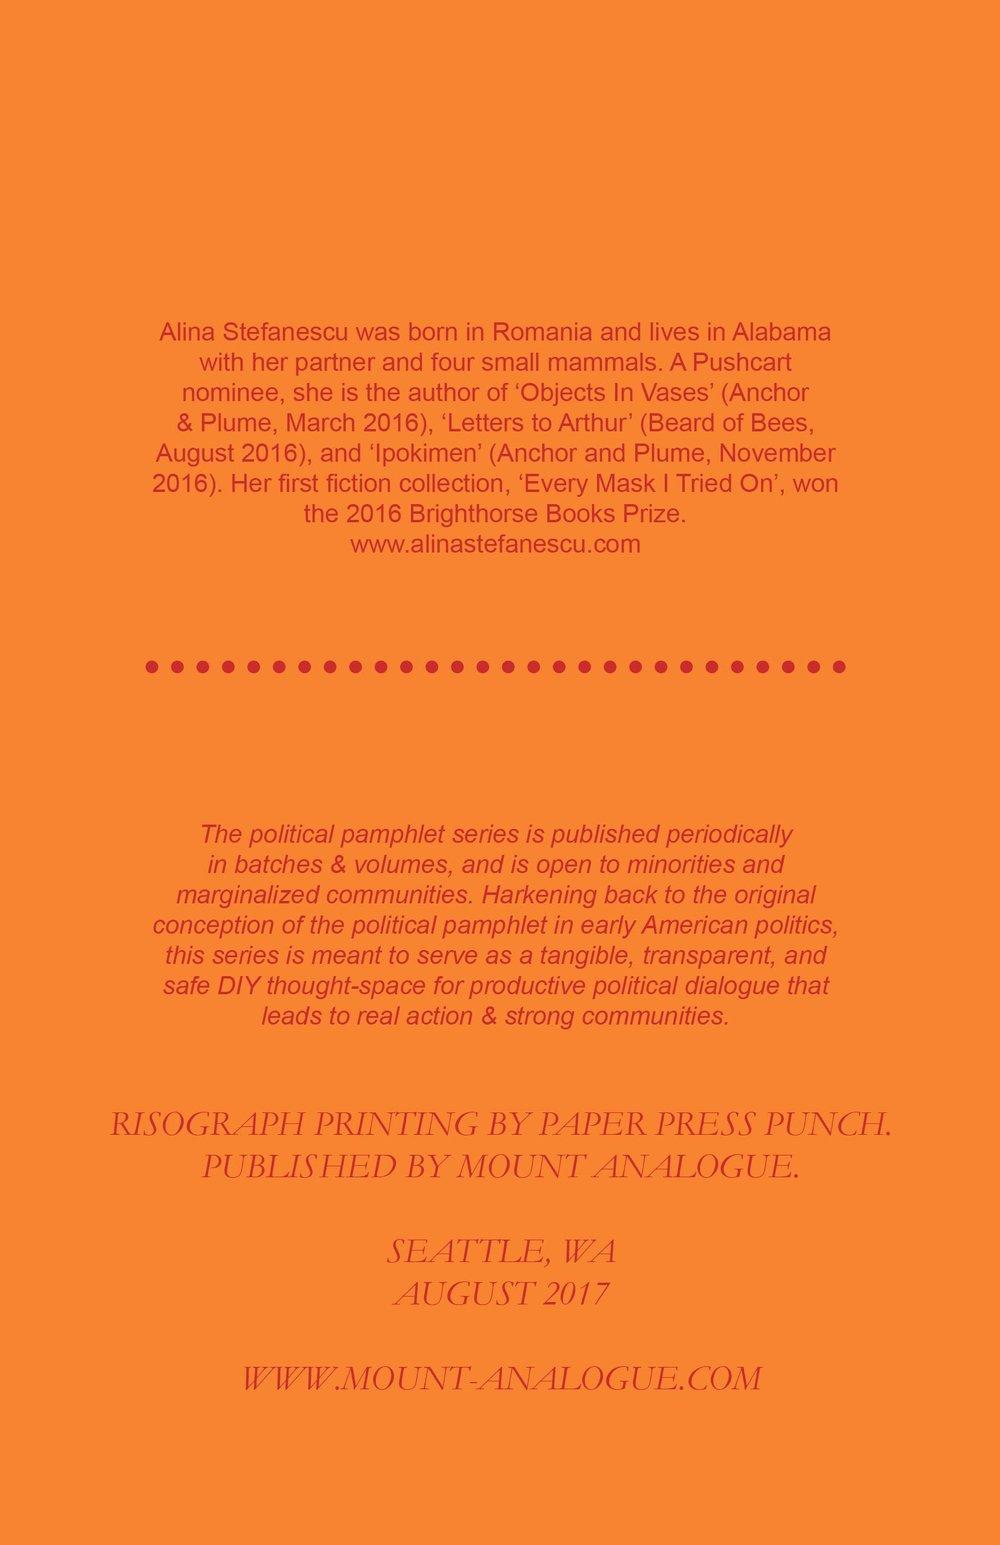 ALINA STEFANESCU.pdf-12.jpg